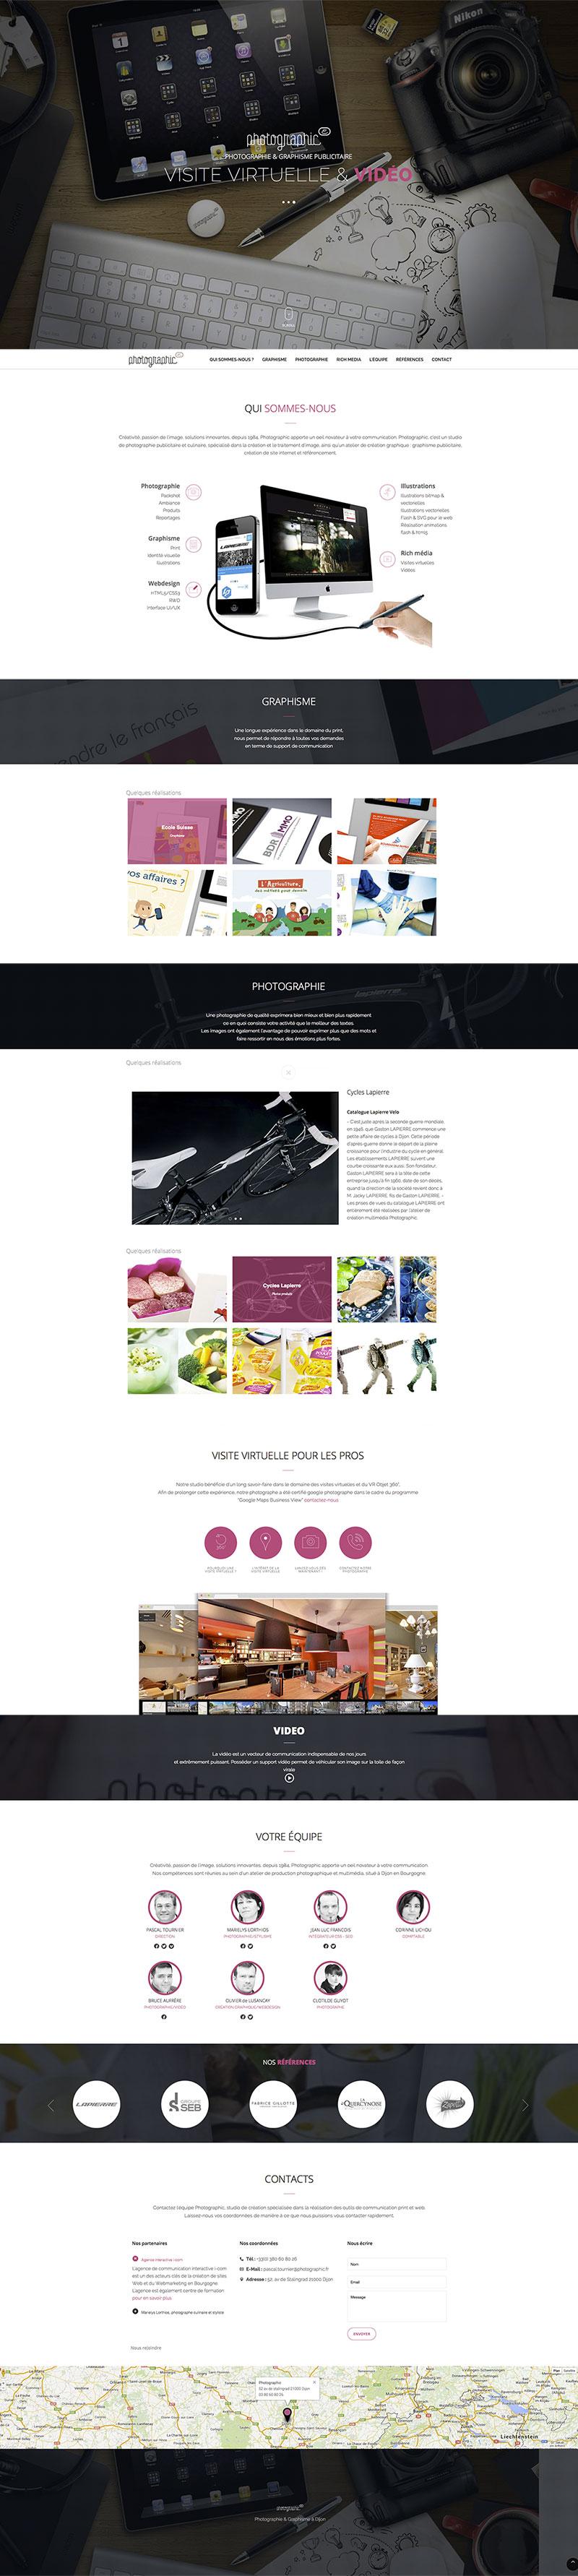 webdesign - parallax